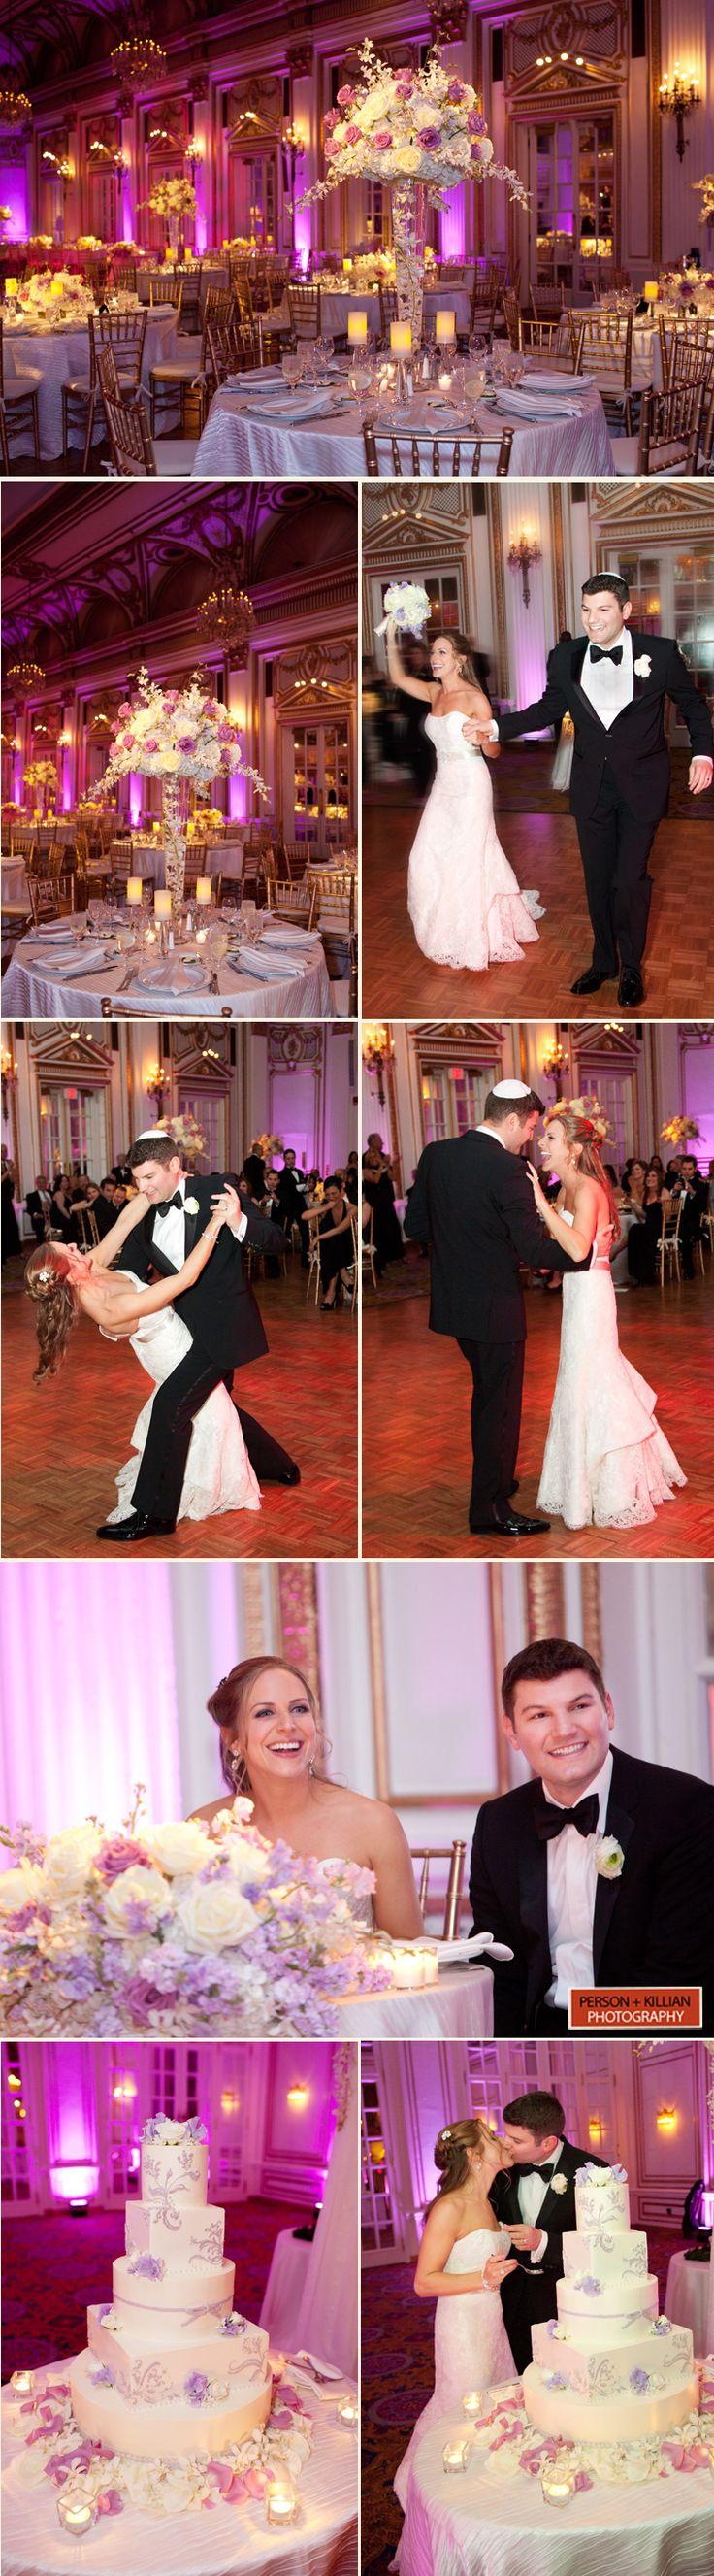 Fairmont Copley Plaza Boston Wedding Photographs